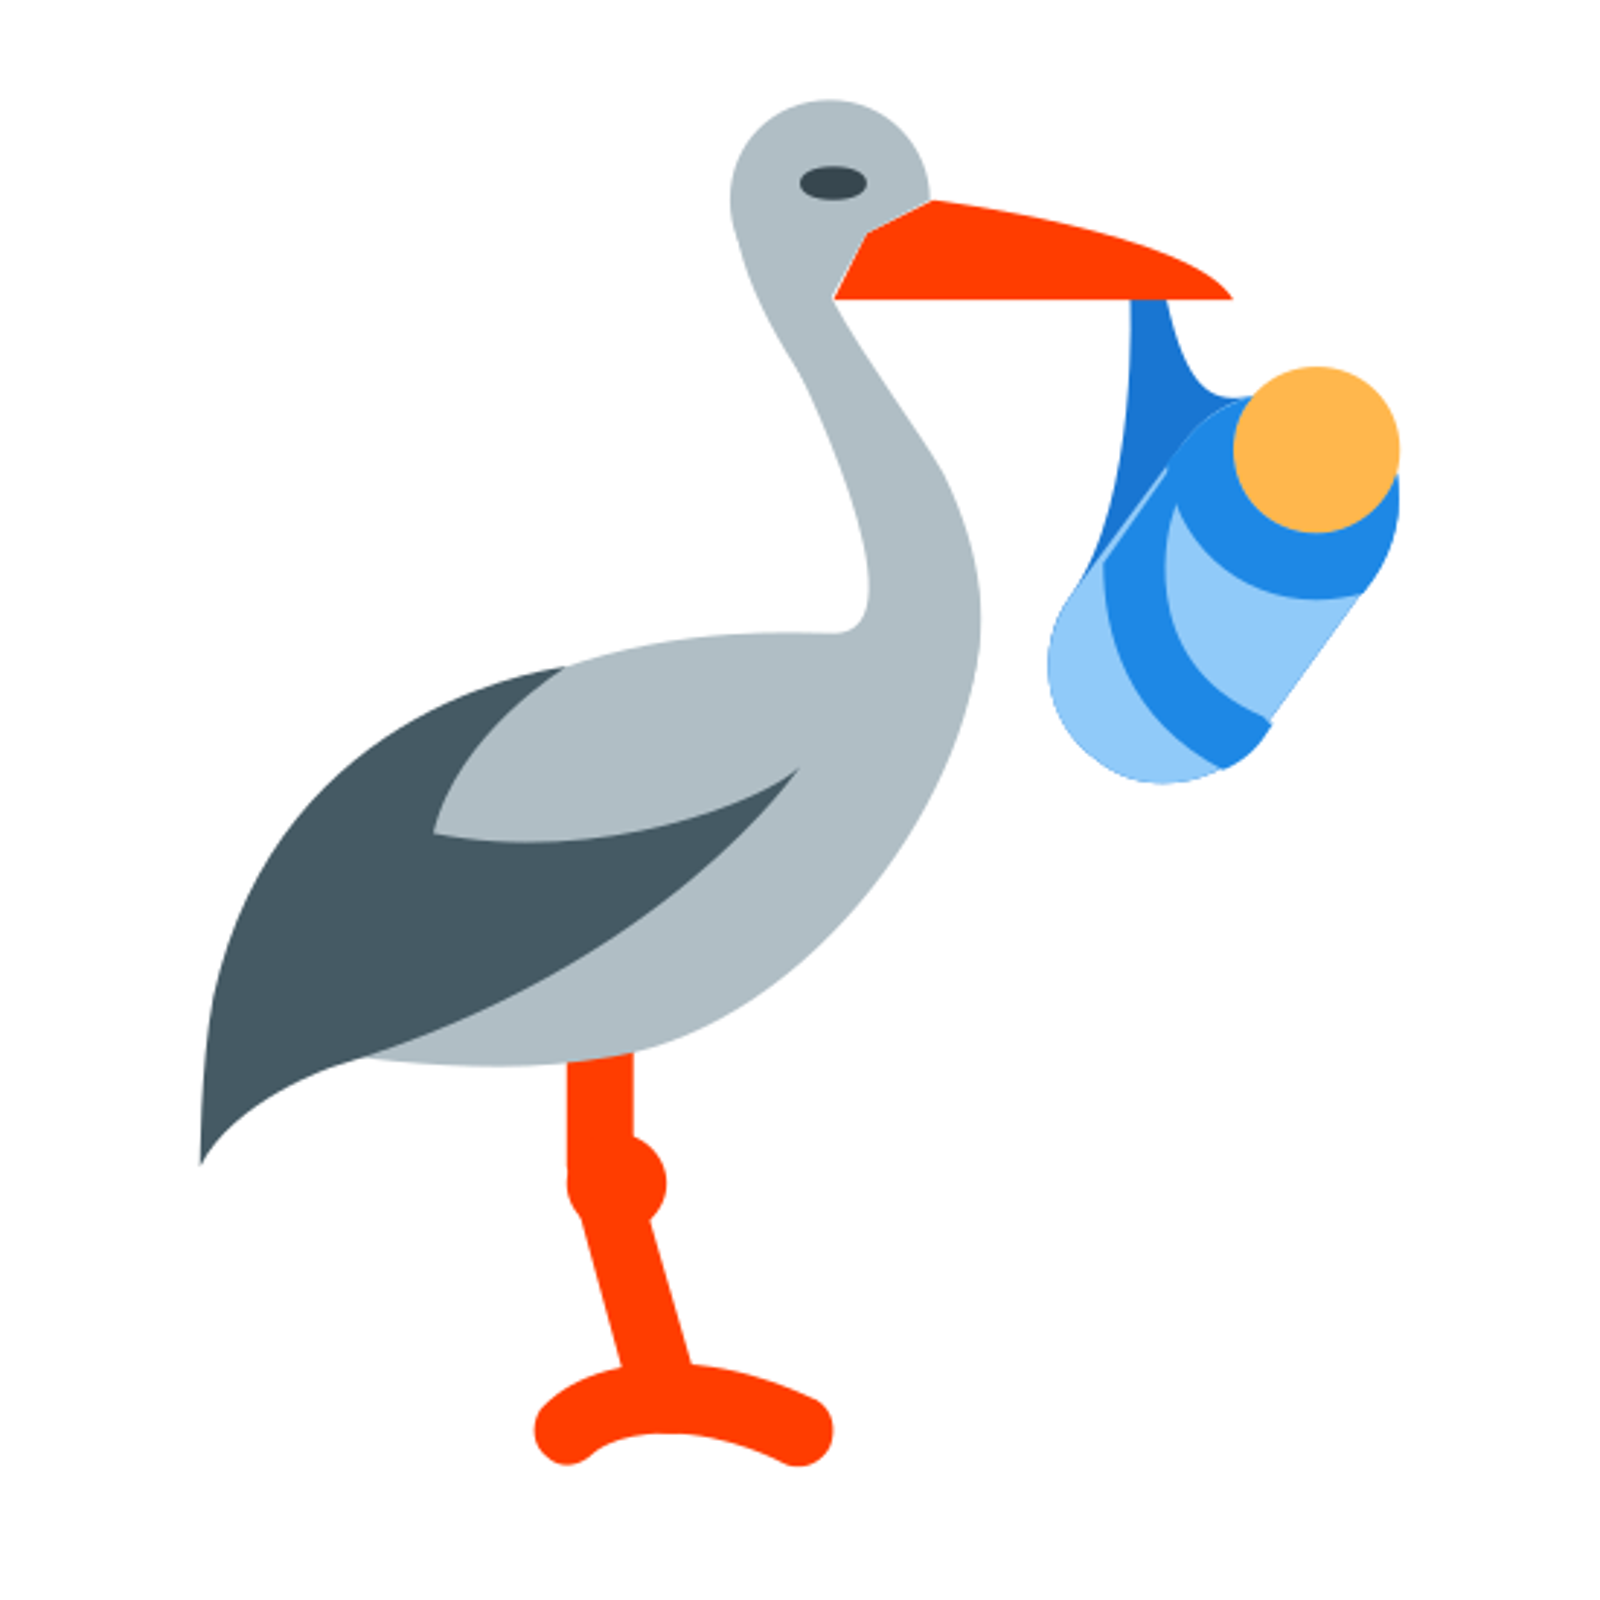 Cigogne portant un paquet icon